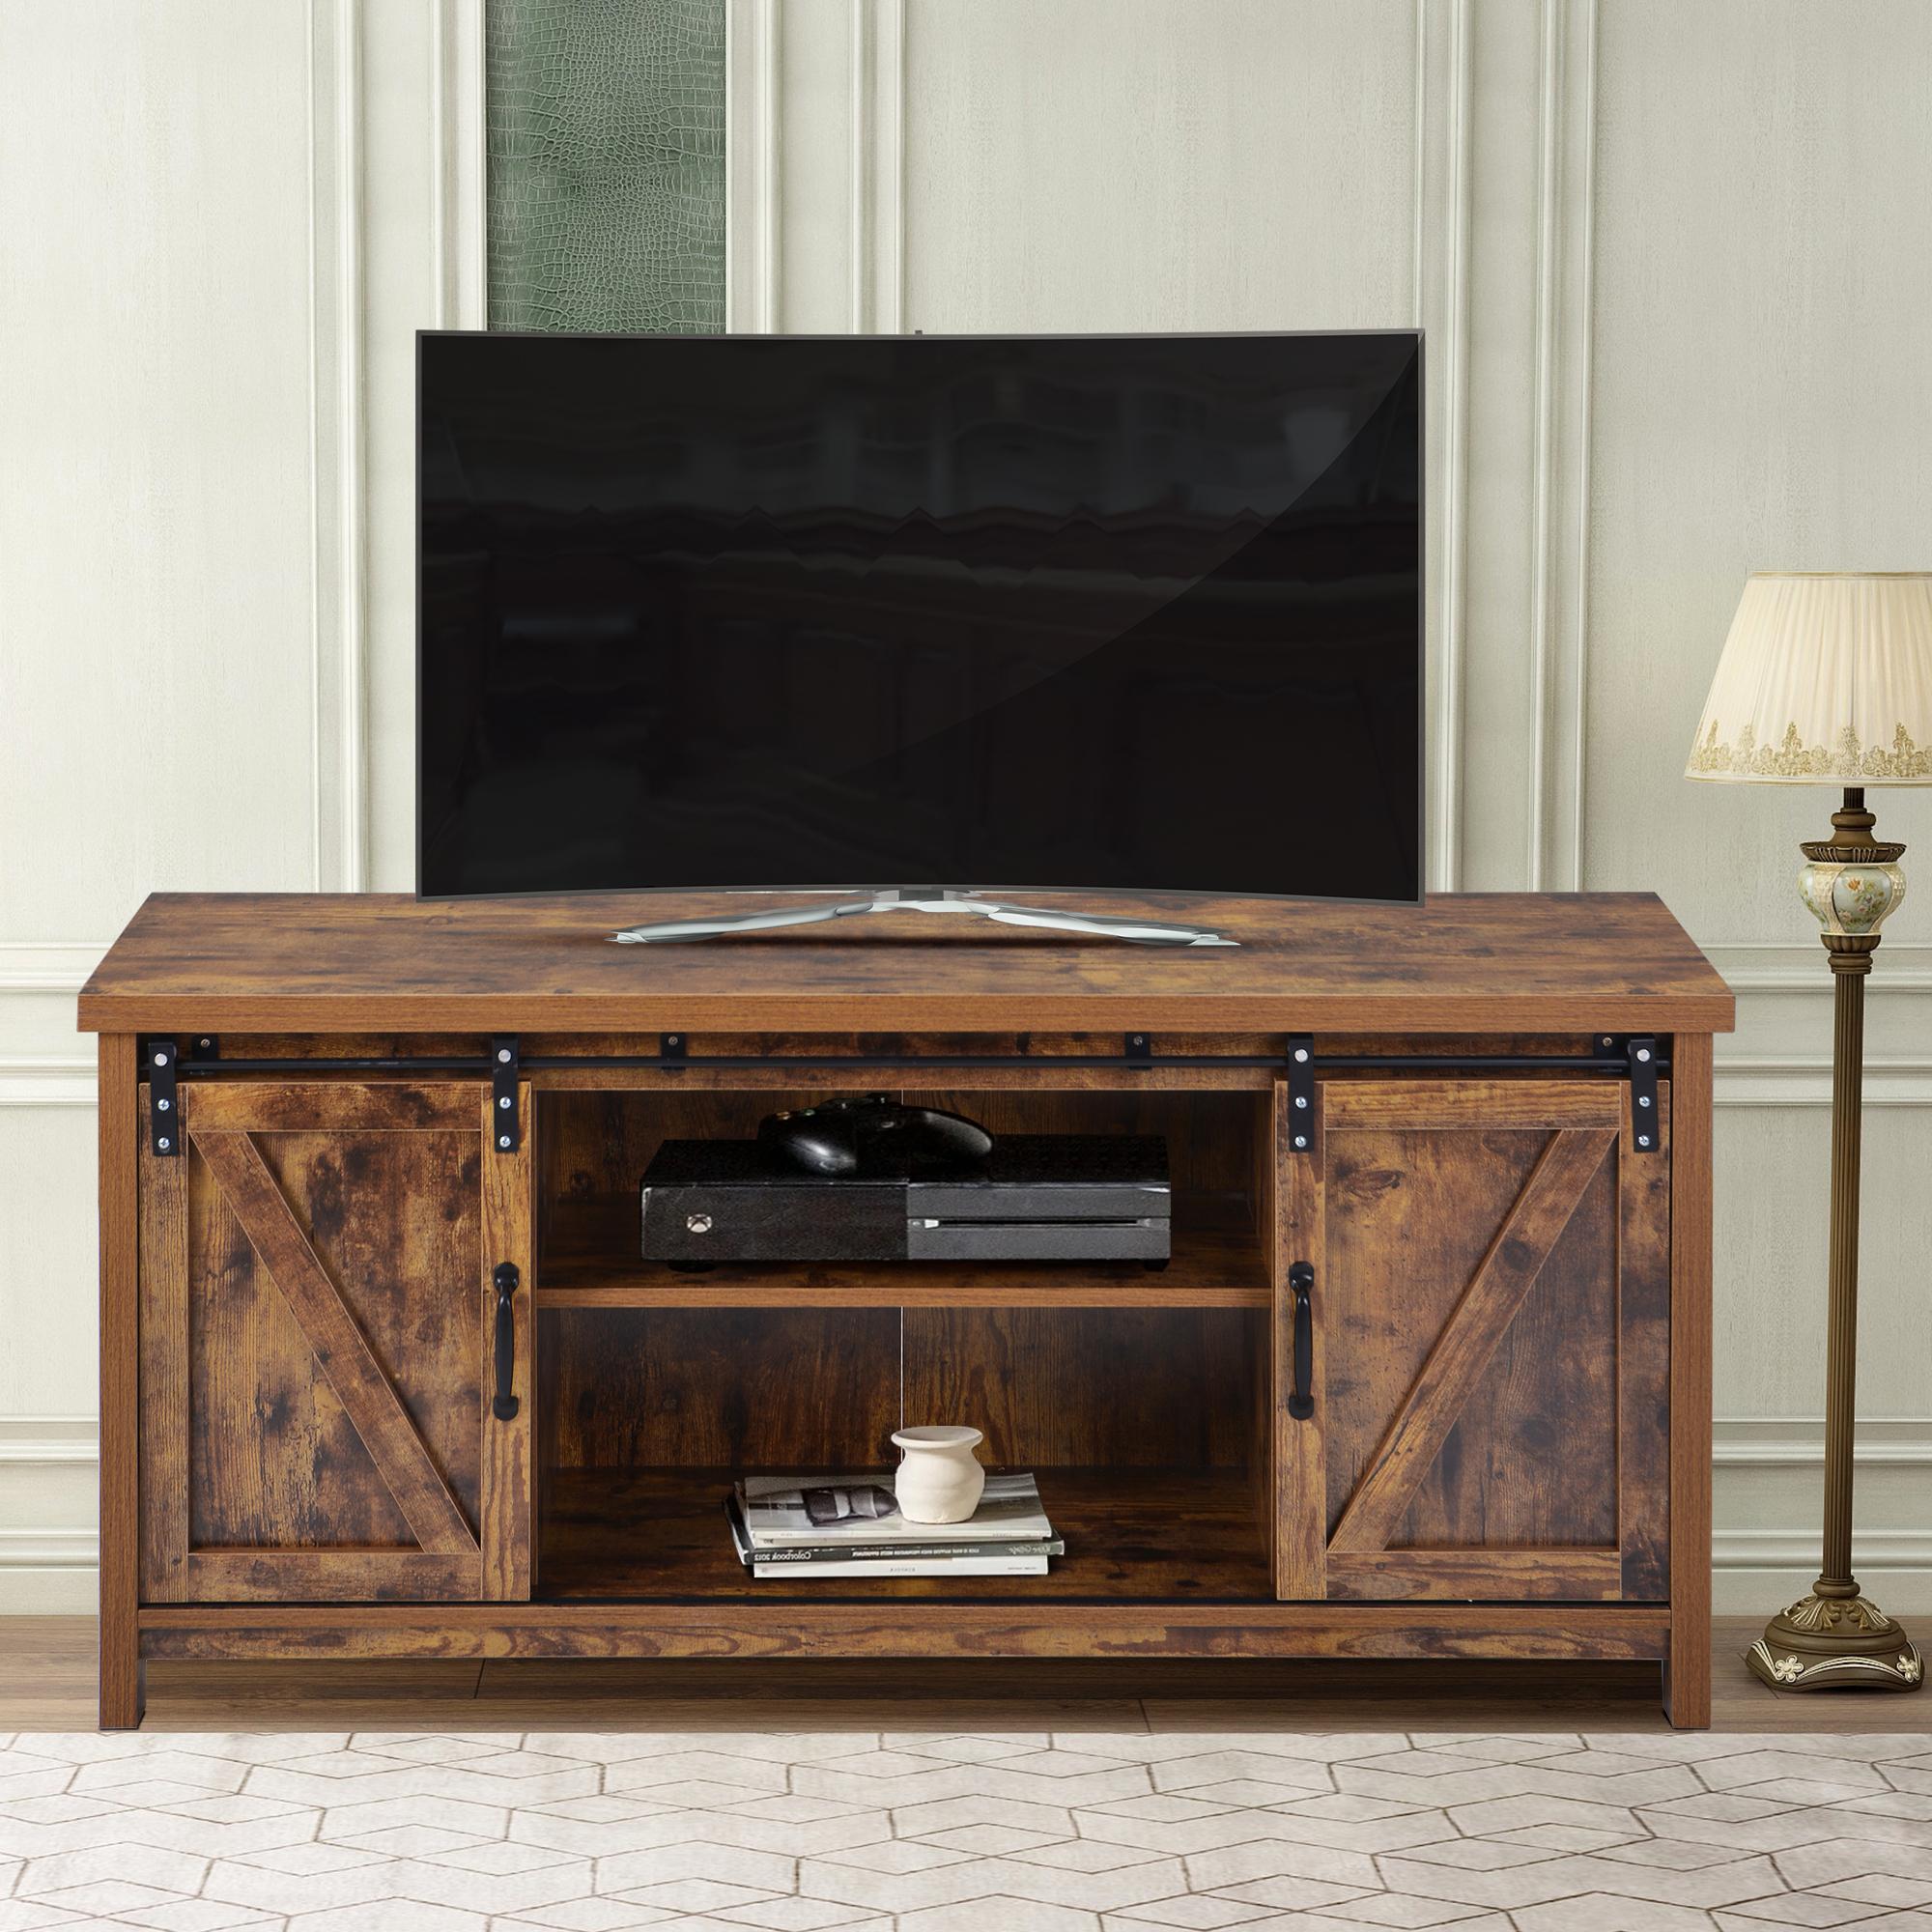 Well Liked Barn Door Wood Tv Stands Throughout Urhomepro Corner Tv Stand, Modern Farmhouse Barn Door Tv (View 4 of 10)